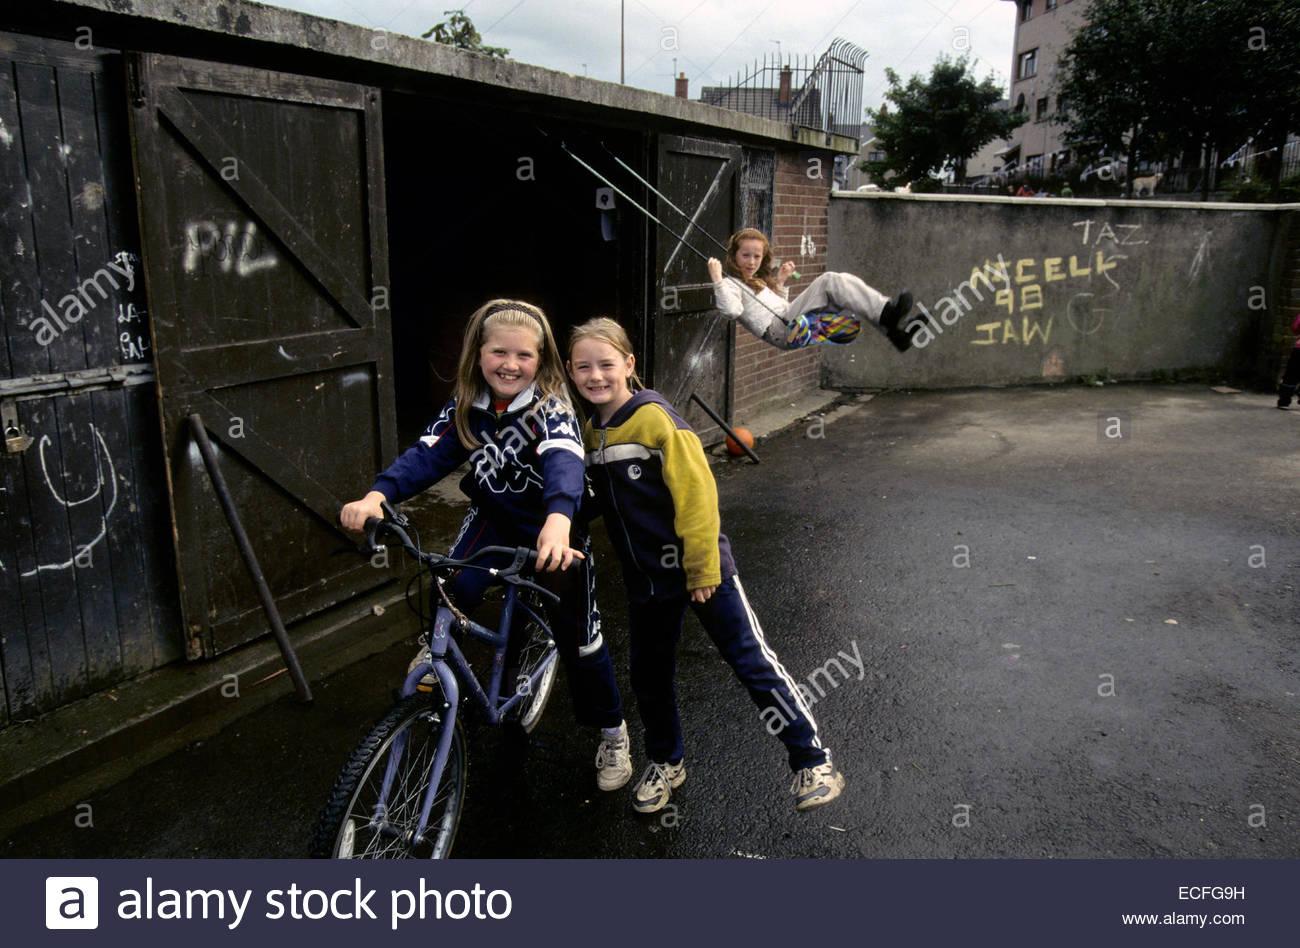 Northern Ireland, Belfast. Playing children in Bogside, catholic area. - Stock Image